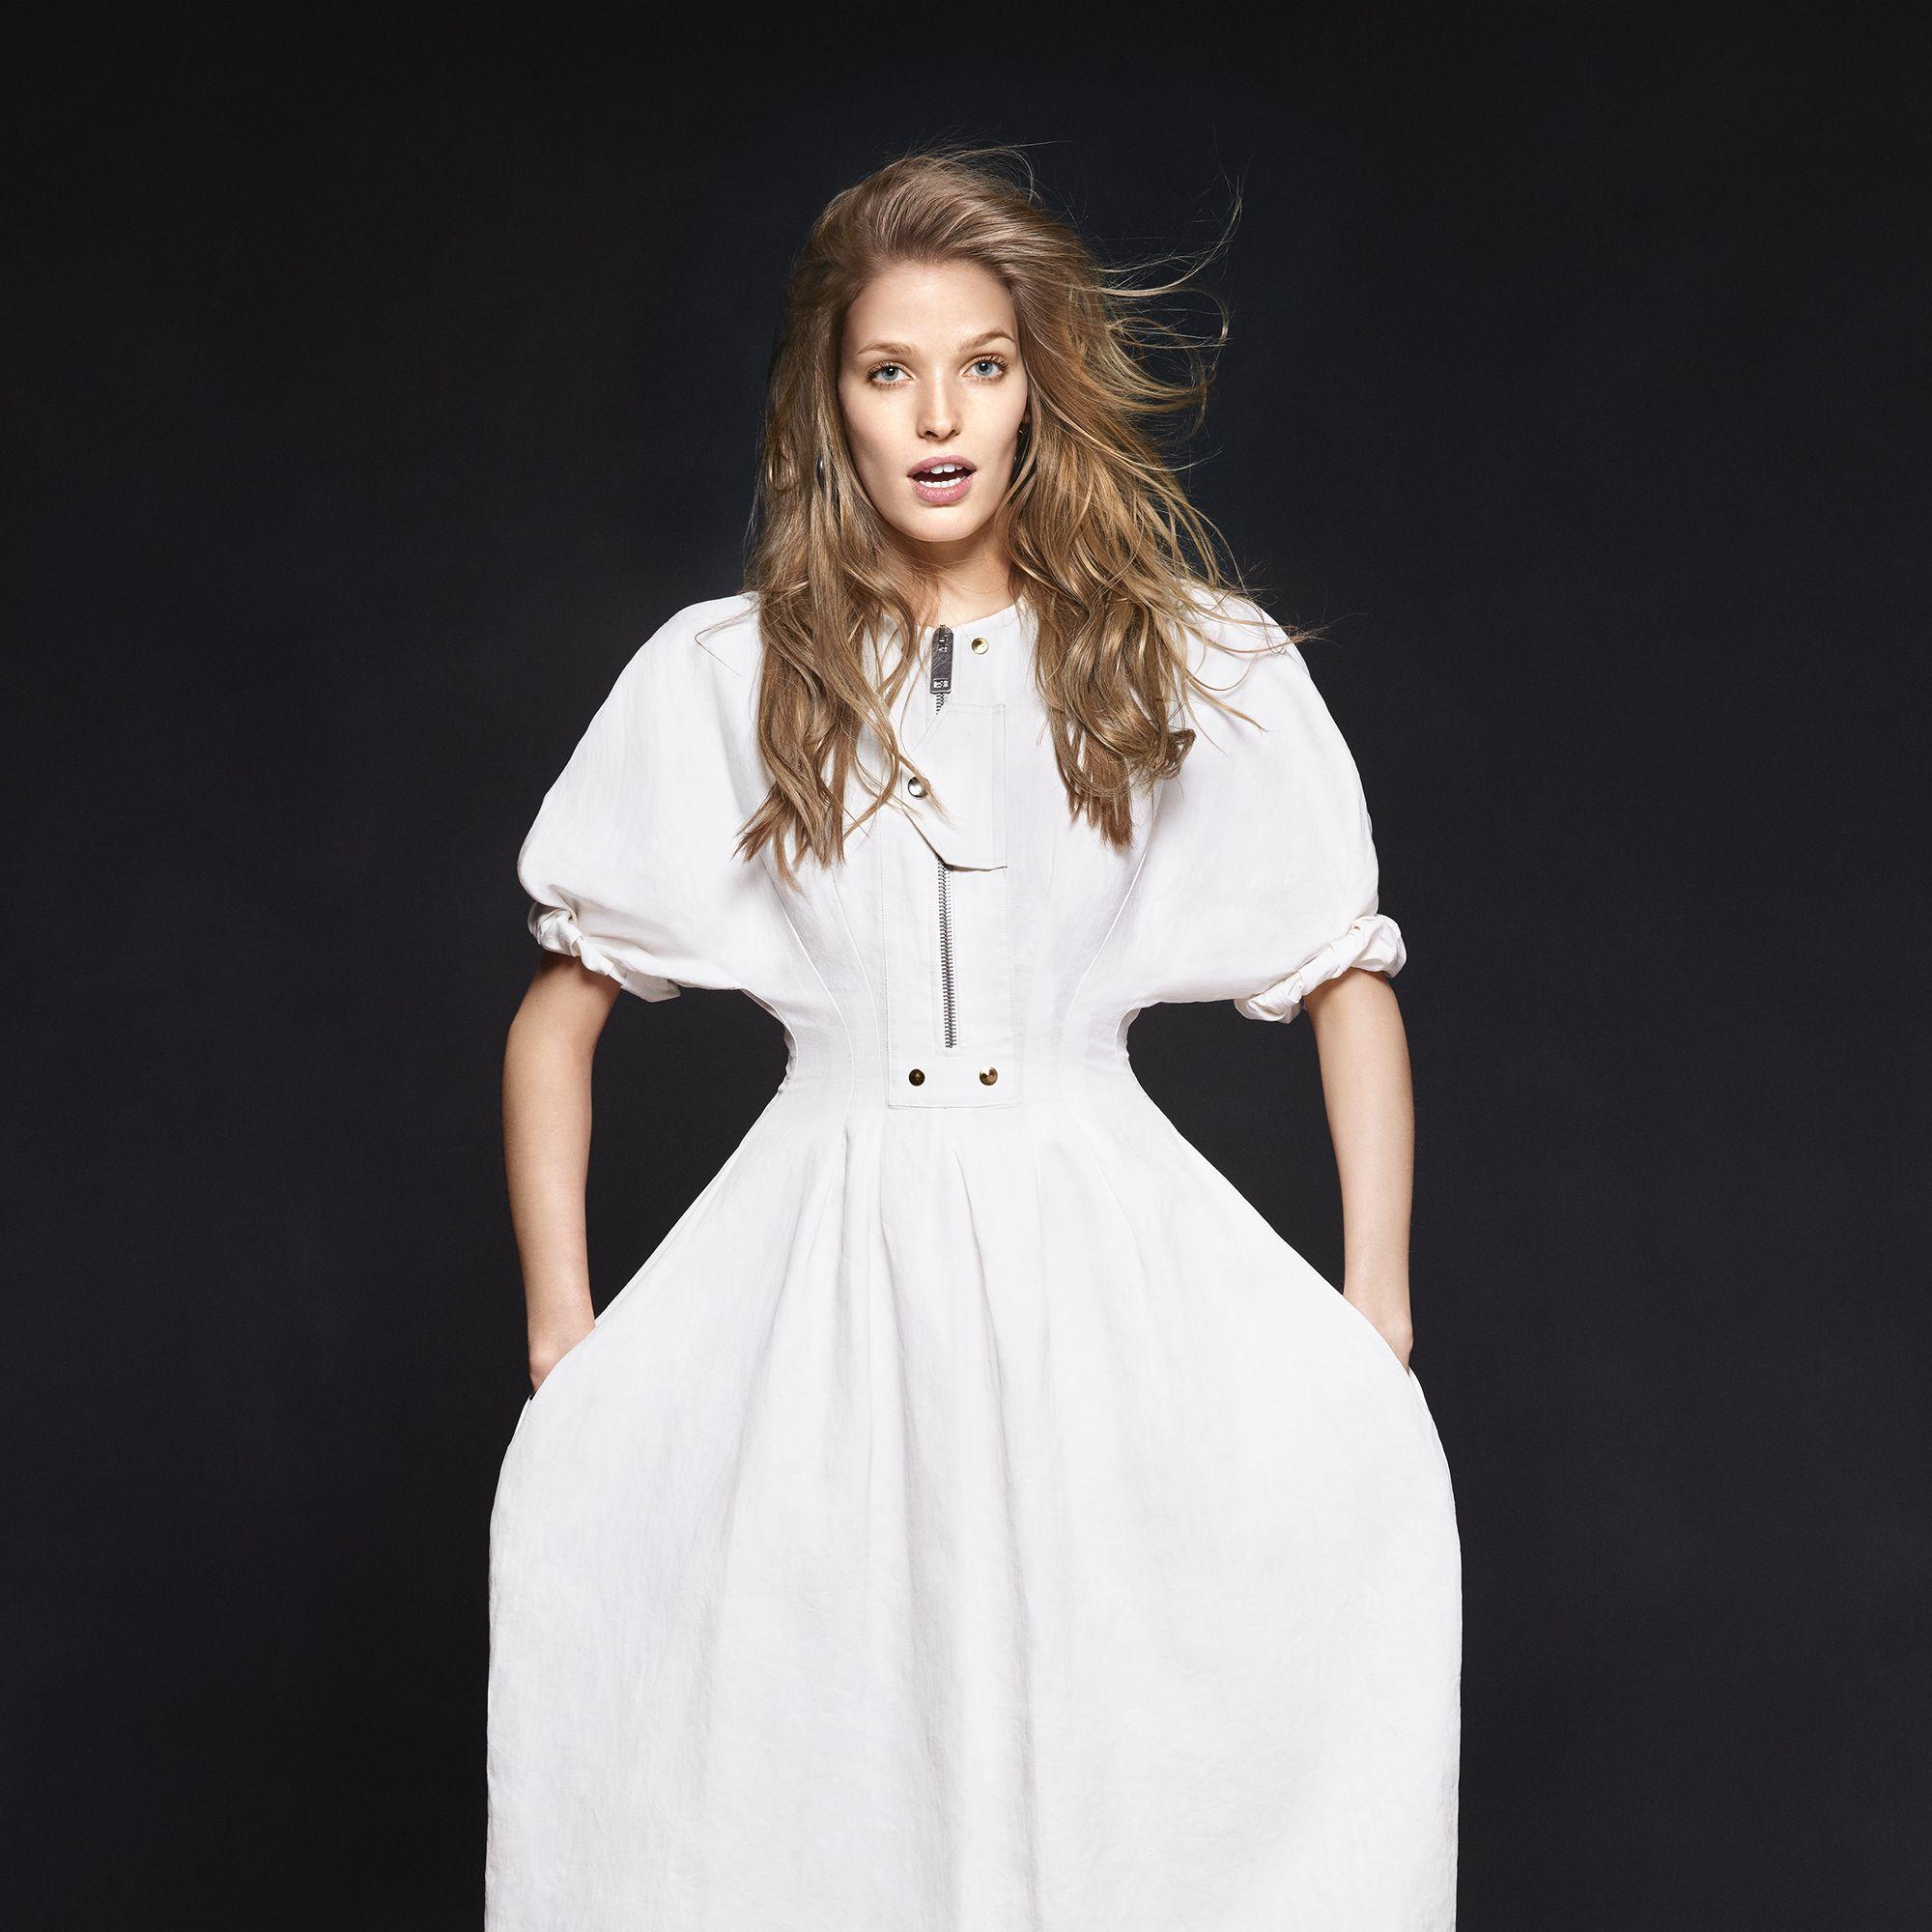 <p>A crisp sculpted dress flatters every figure.</p><p><strong>Céline </strong>dress, $2,600, earrings, $1,050, and boots, $1,750, 212-420-7300. </p>